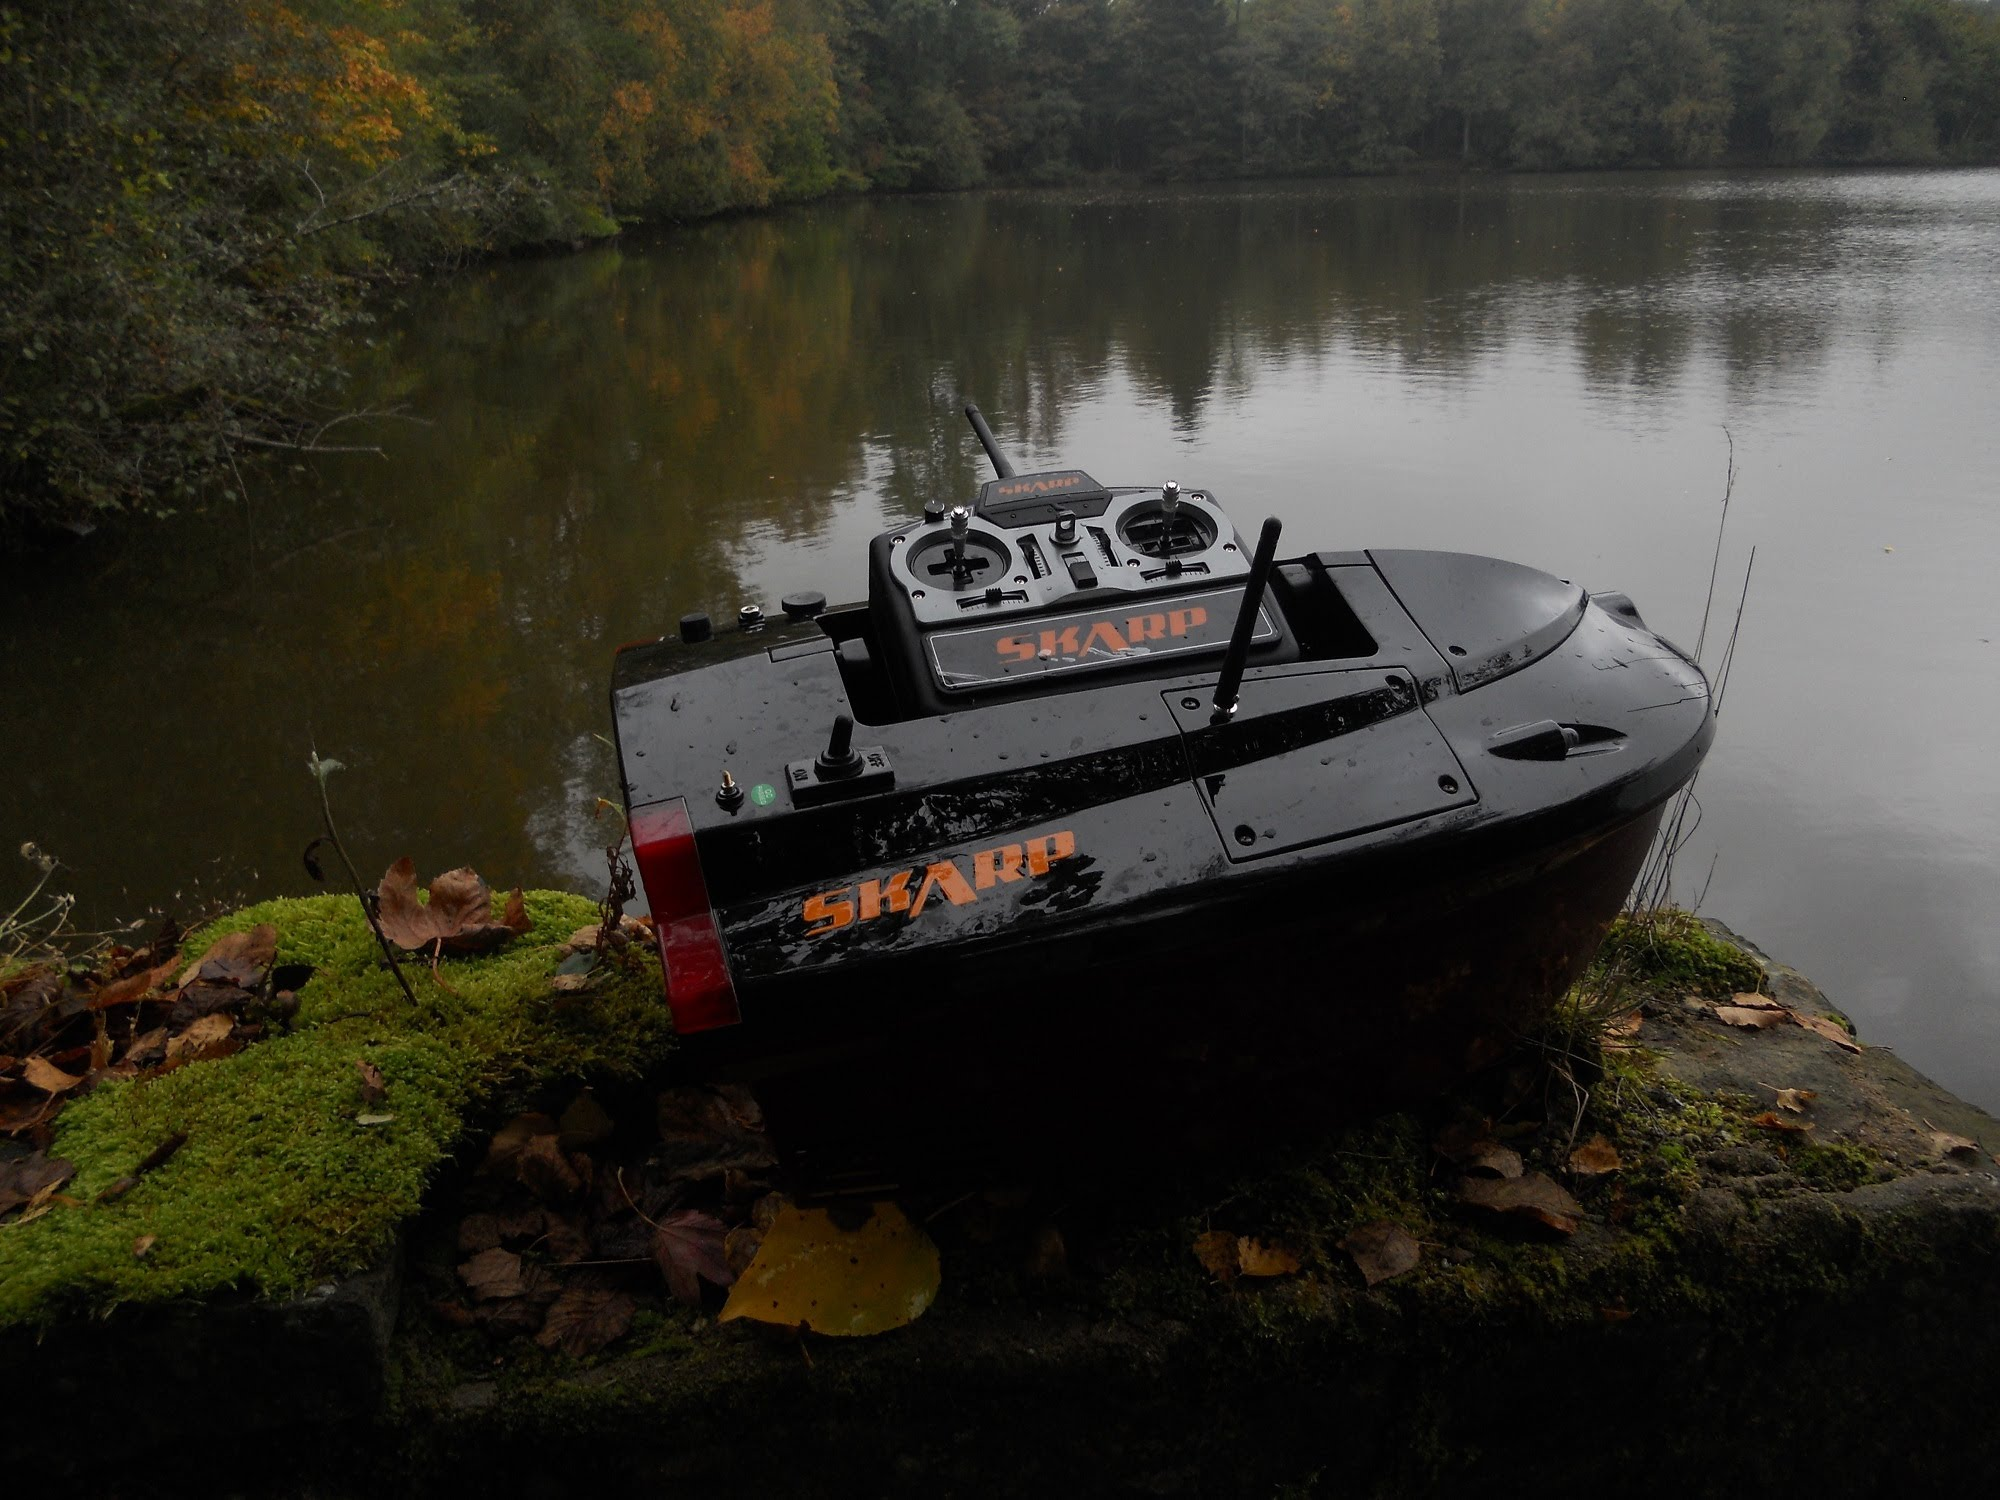 bateau amorceur s60